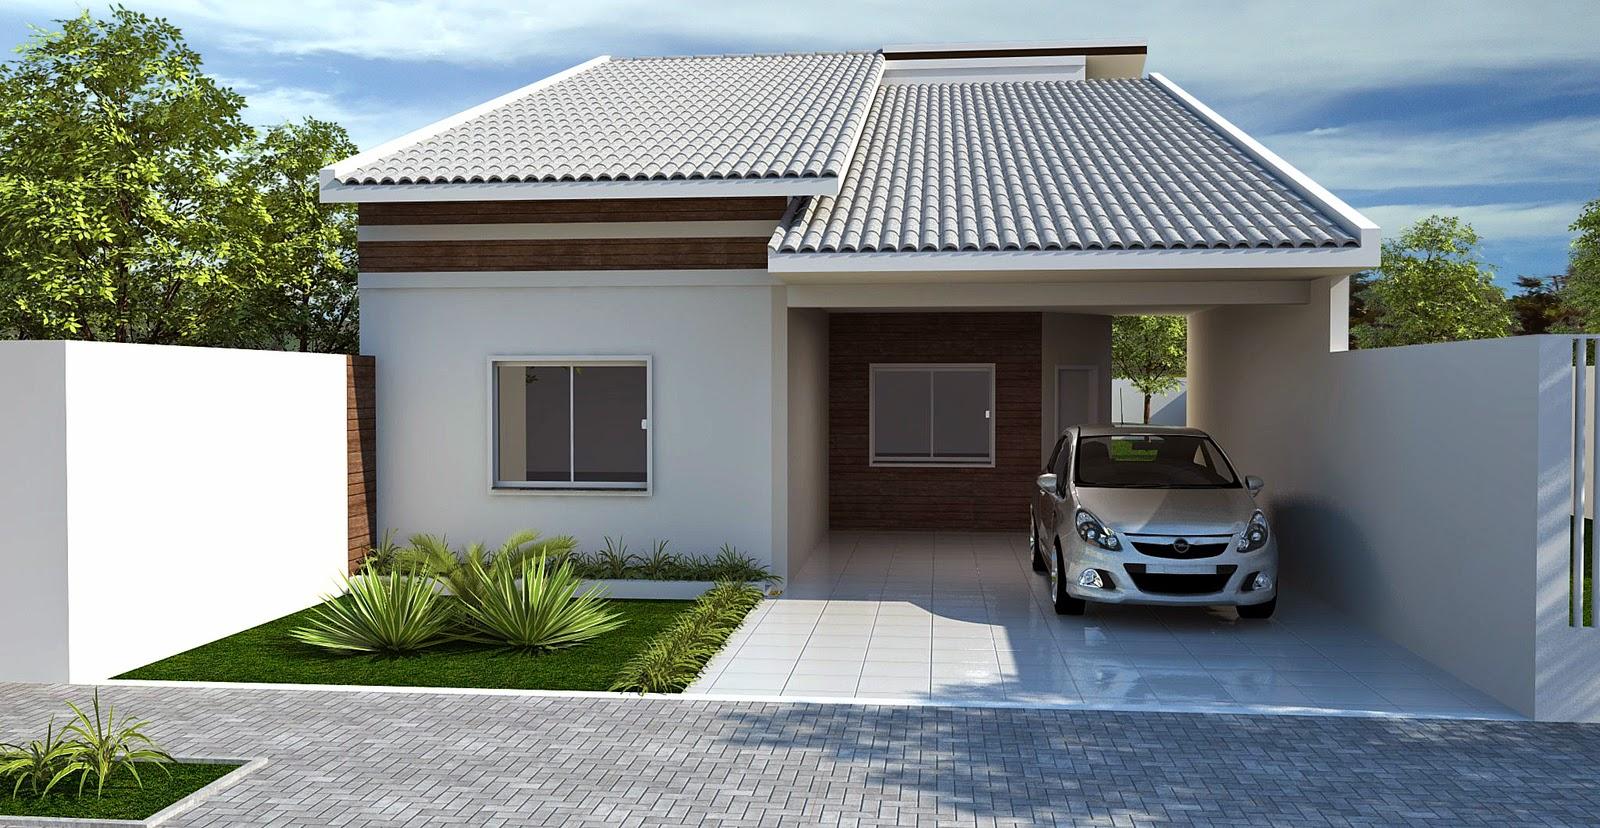 telhado-branco-para-casas-modernas